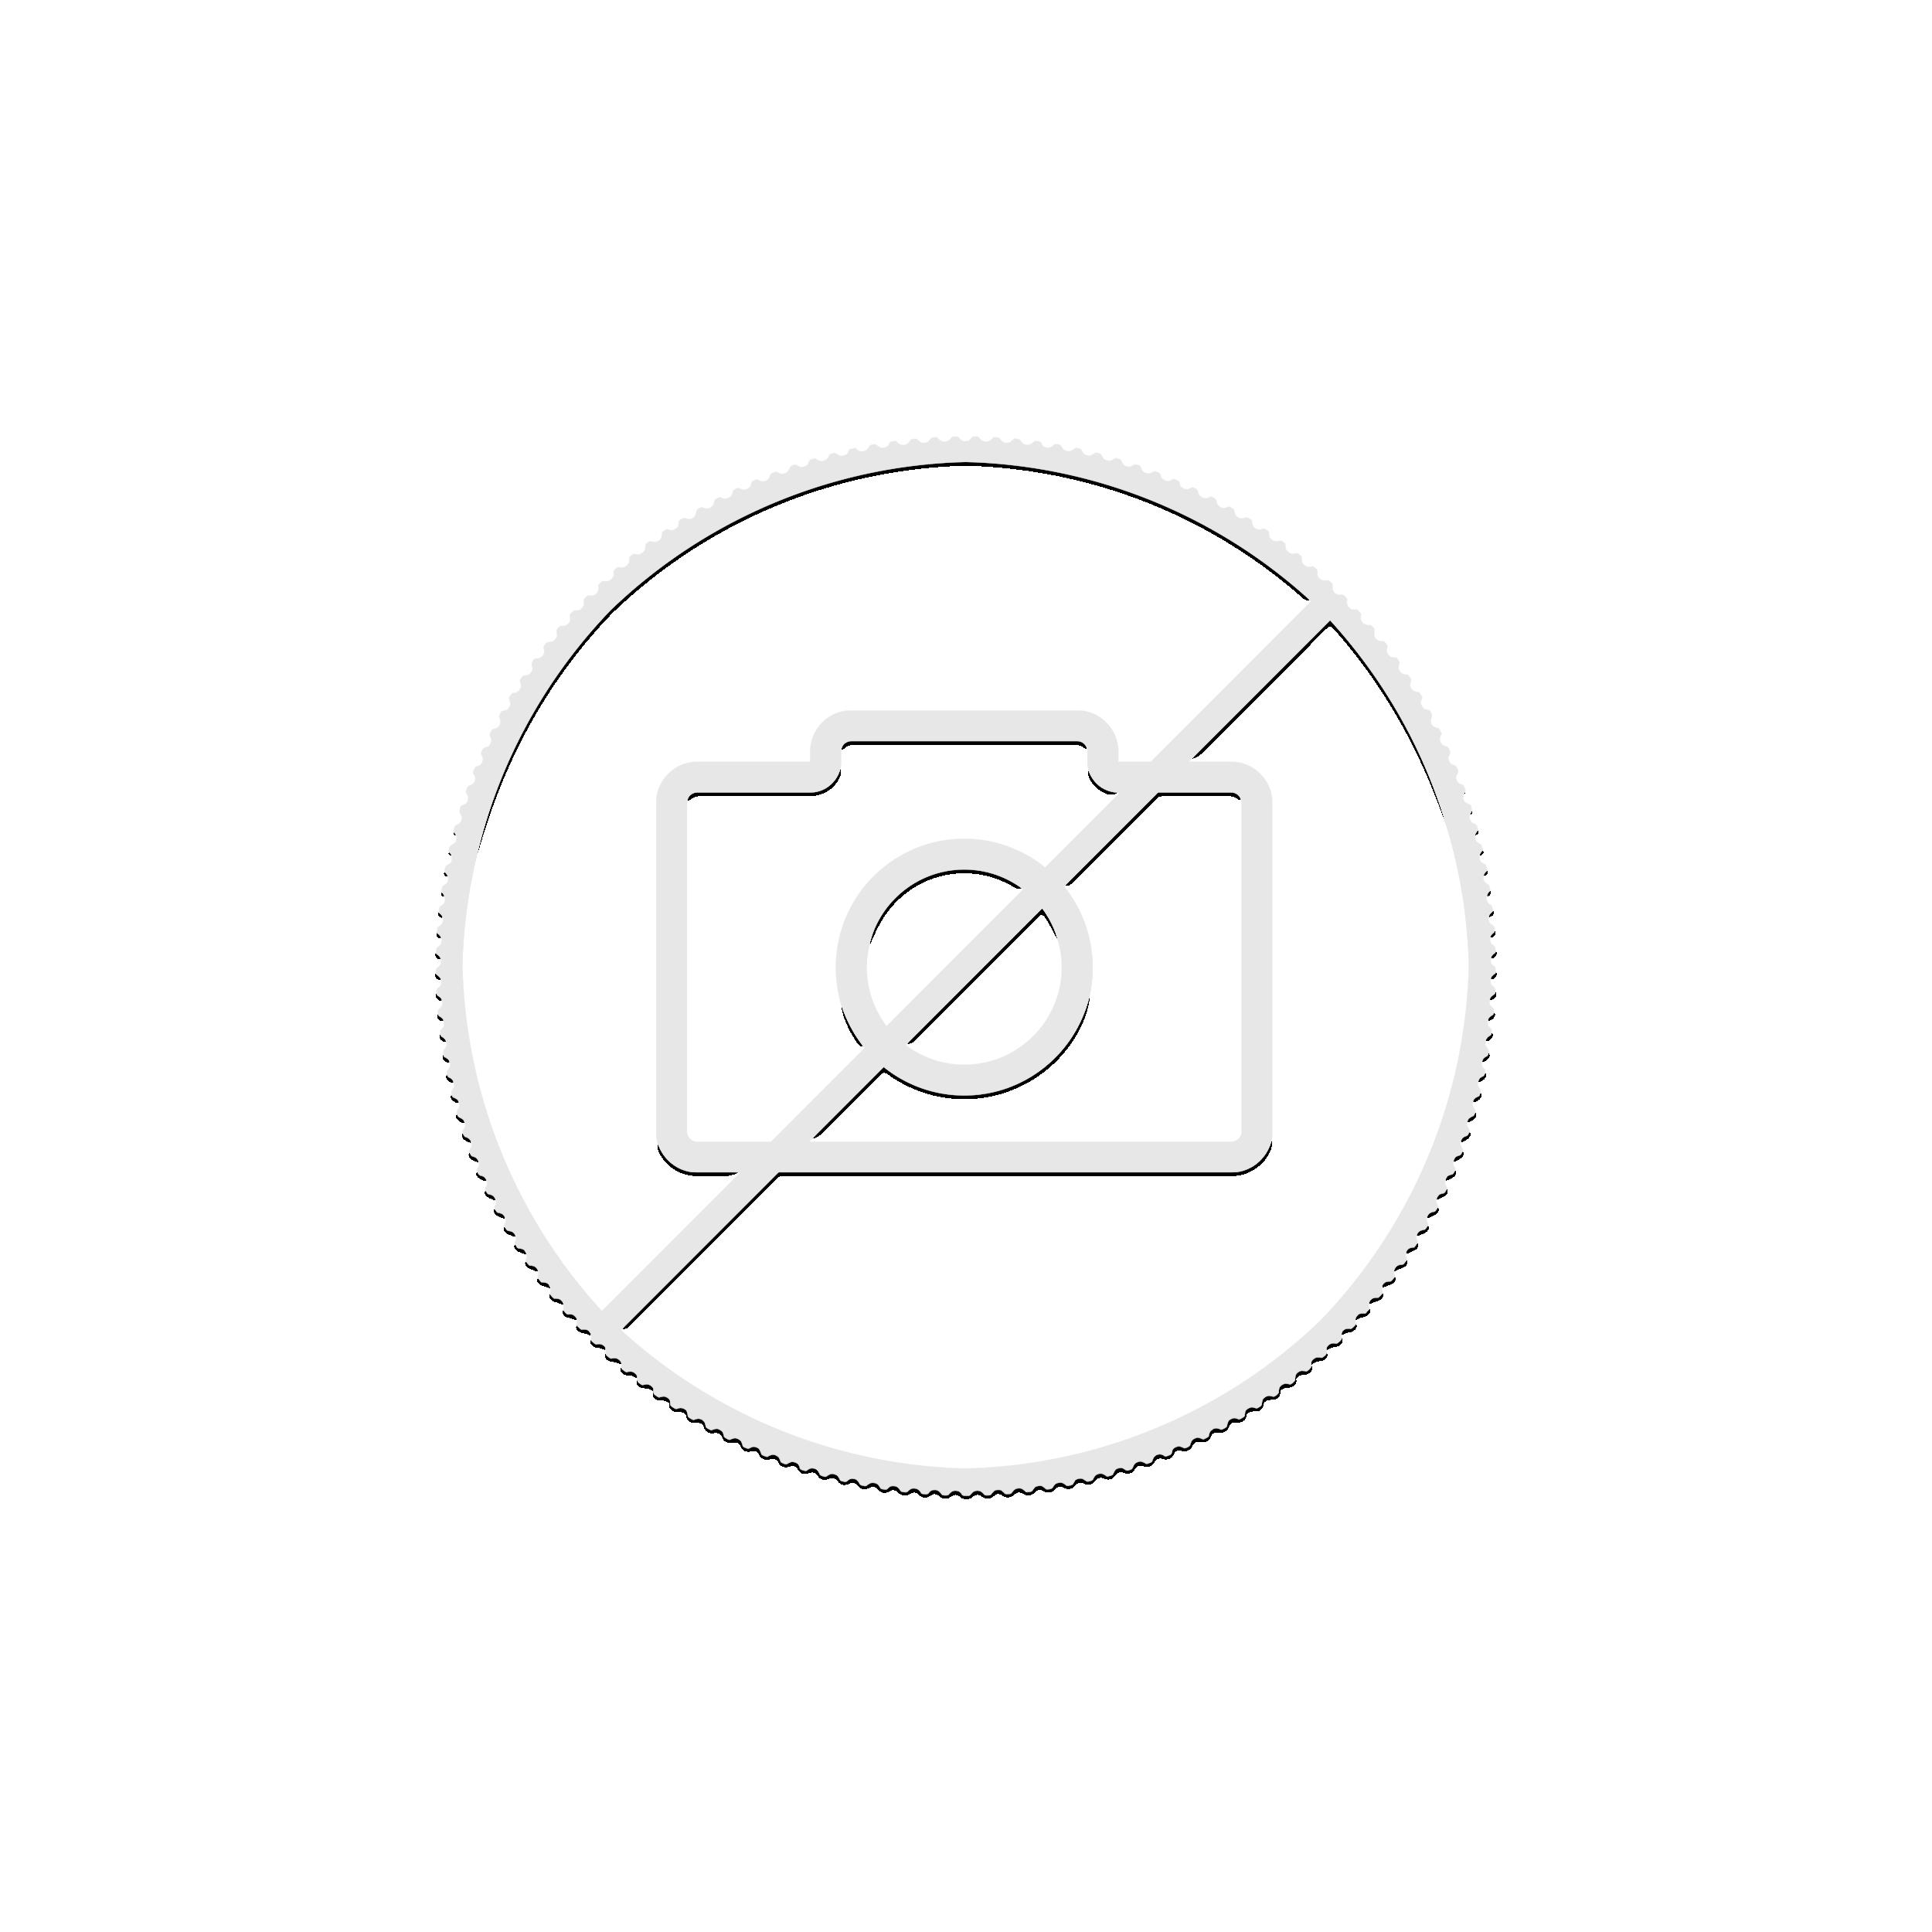 2 troy ounce zilveren munt Mandala panda 2021